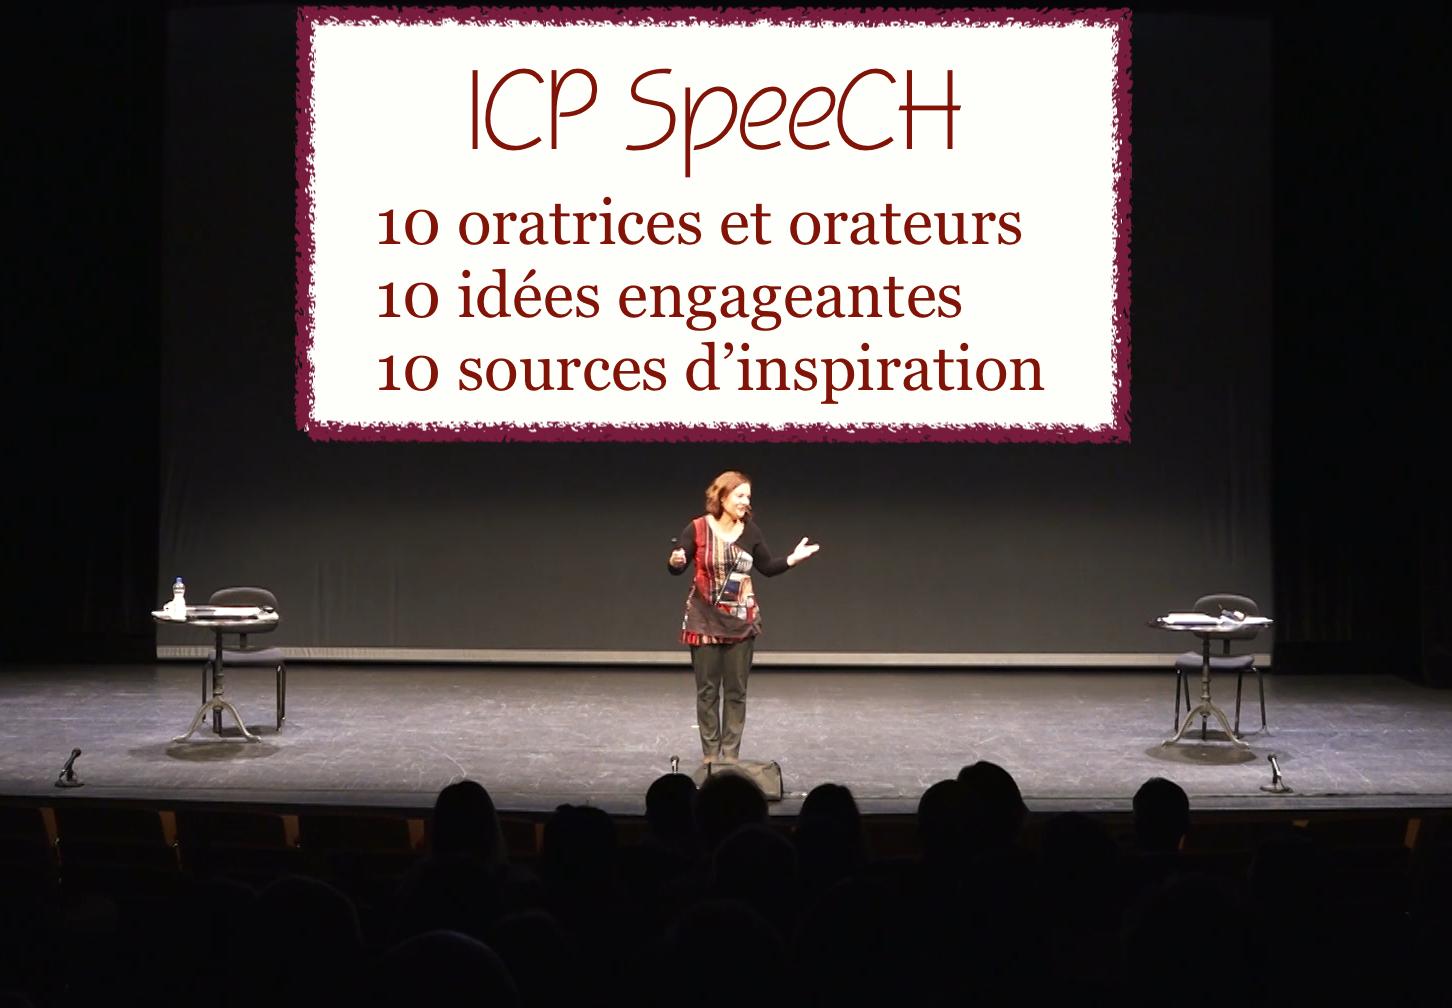 ICP SpeeCH